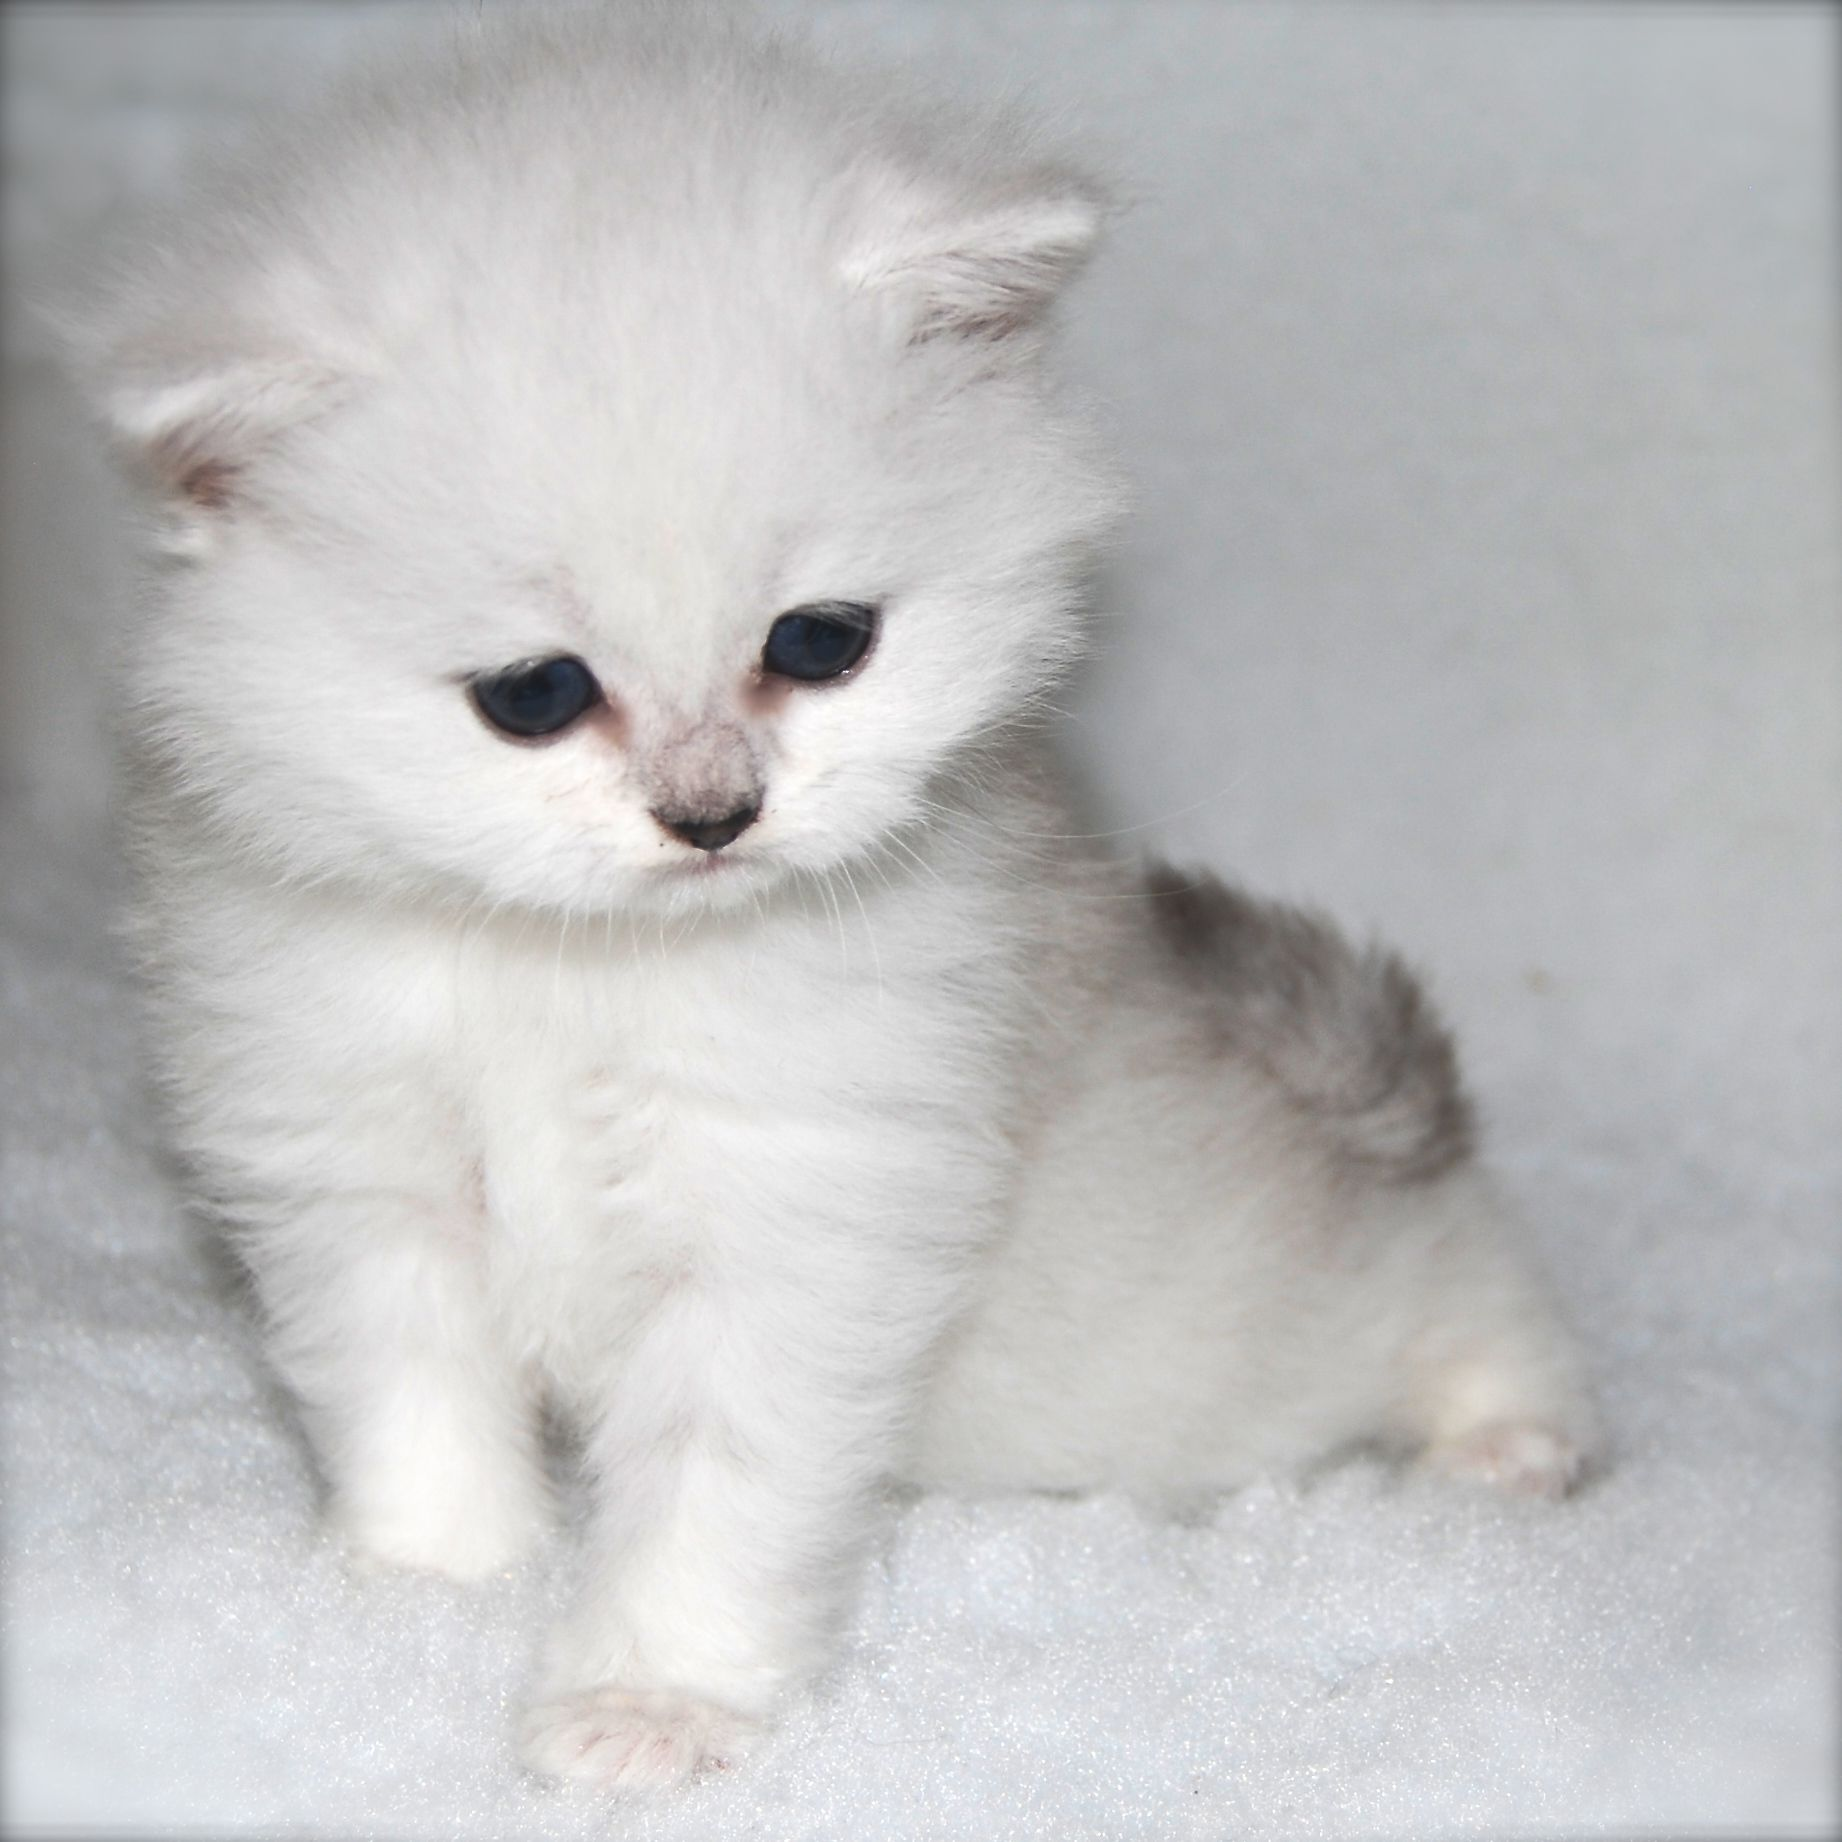 Belle Ayr Snow Lion British Longhair Silver Shaded Ns11 Blh British Shorthair Cats Kittens Snow Lion